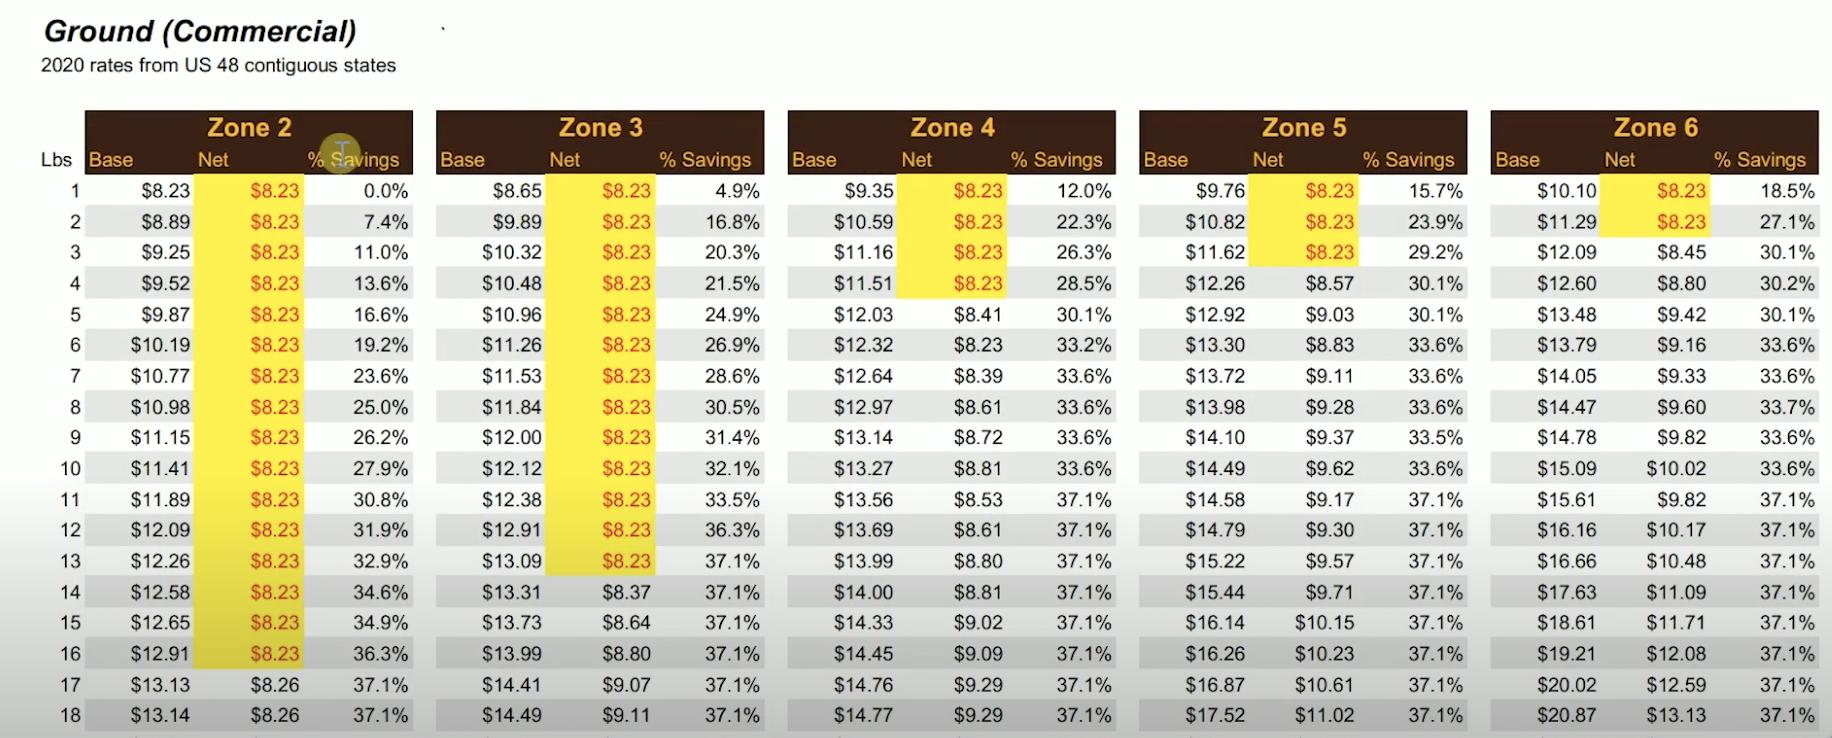 Parcel Minimum Zones - Parcel BI